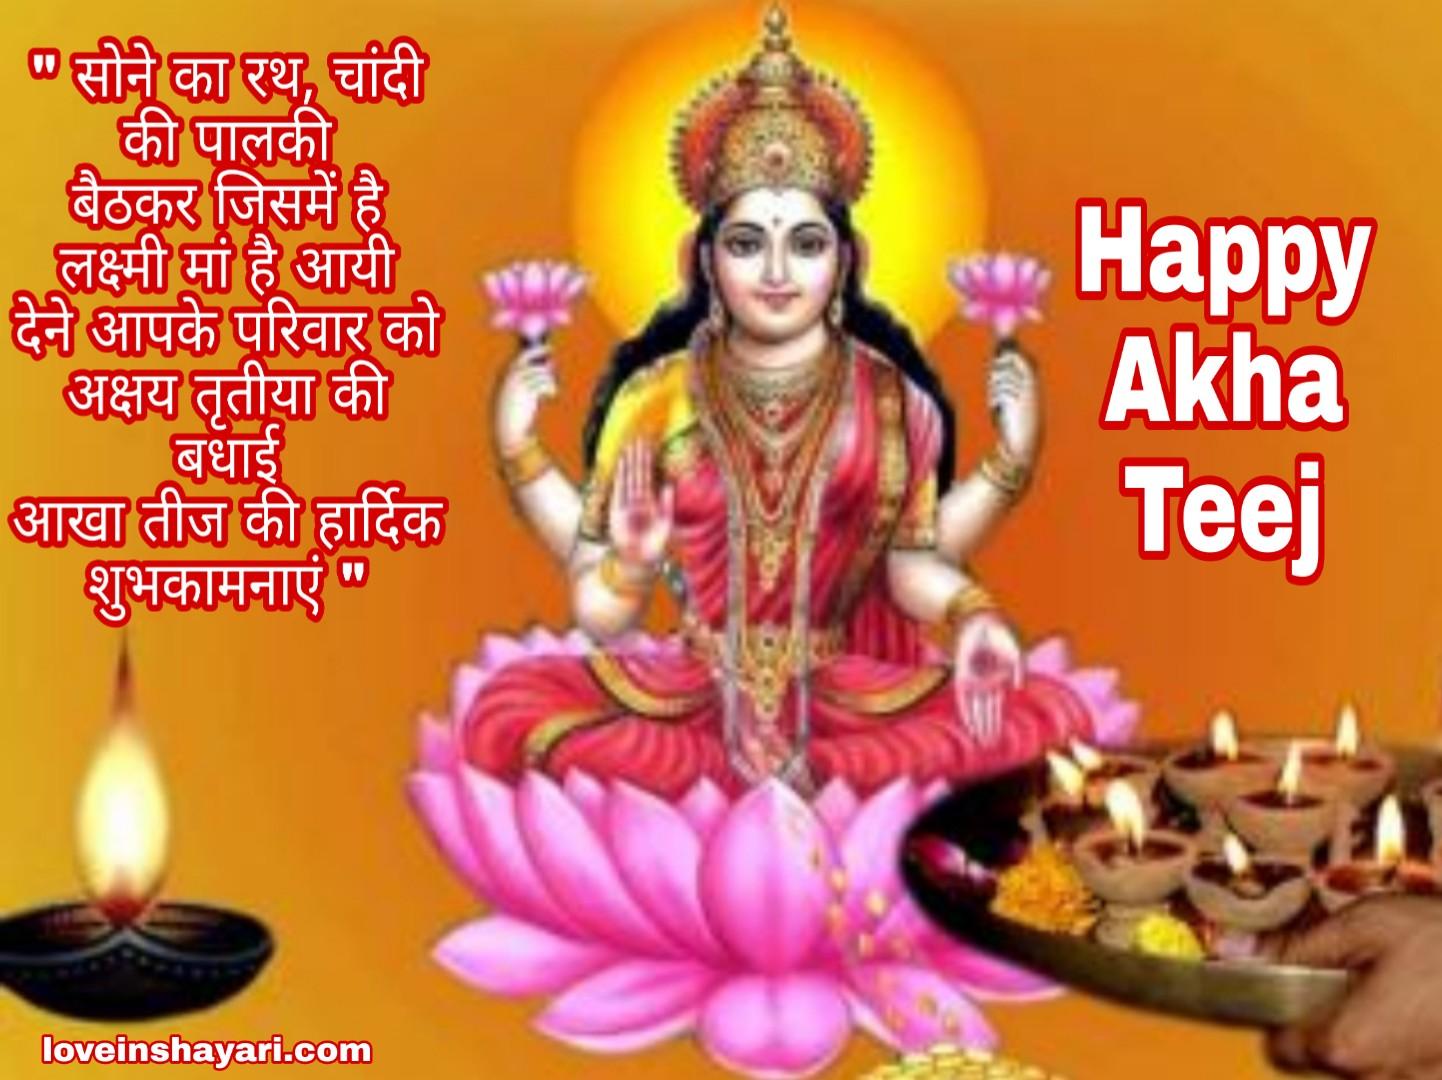 Akha Teej wishes shayari quotes messages